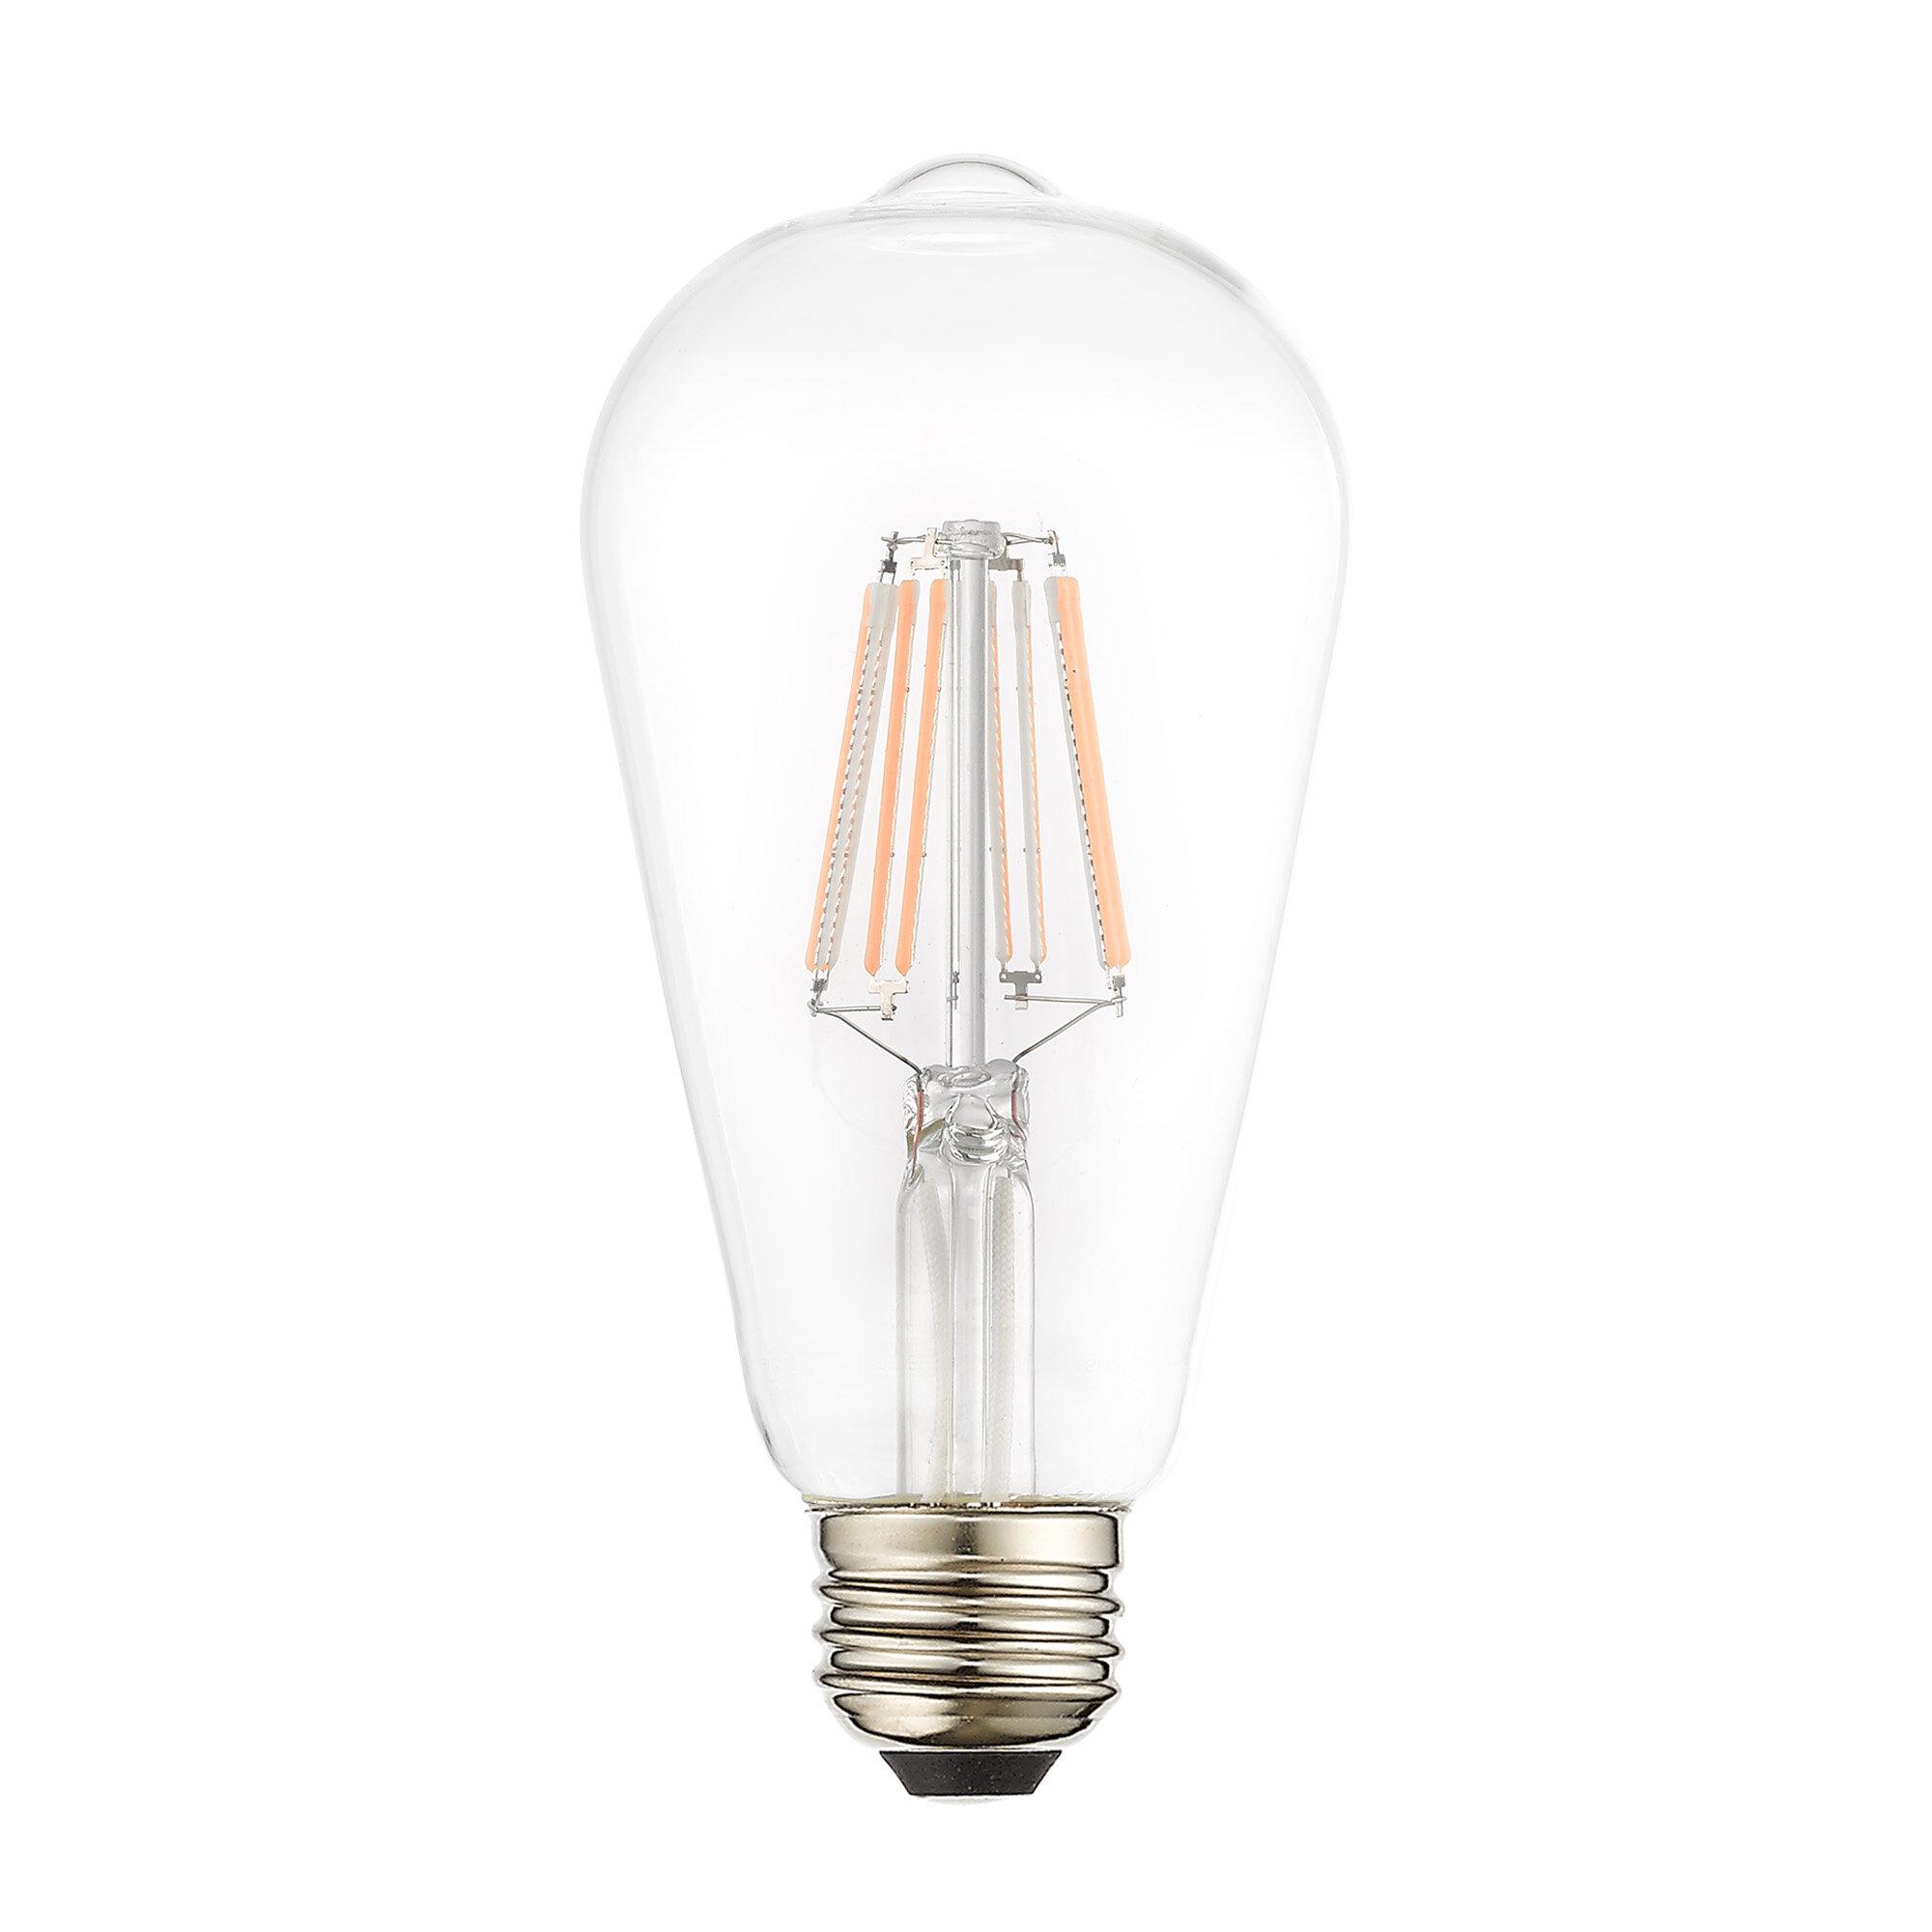 7 7 Watt 60 Watt Equivalent St19 Led Dimmable Light Bulb Warm White 2700k E26 Medium Standard Base Reviews Joss Main